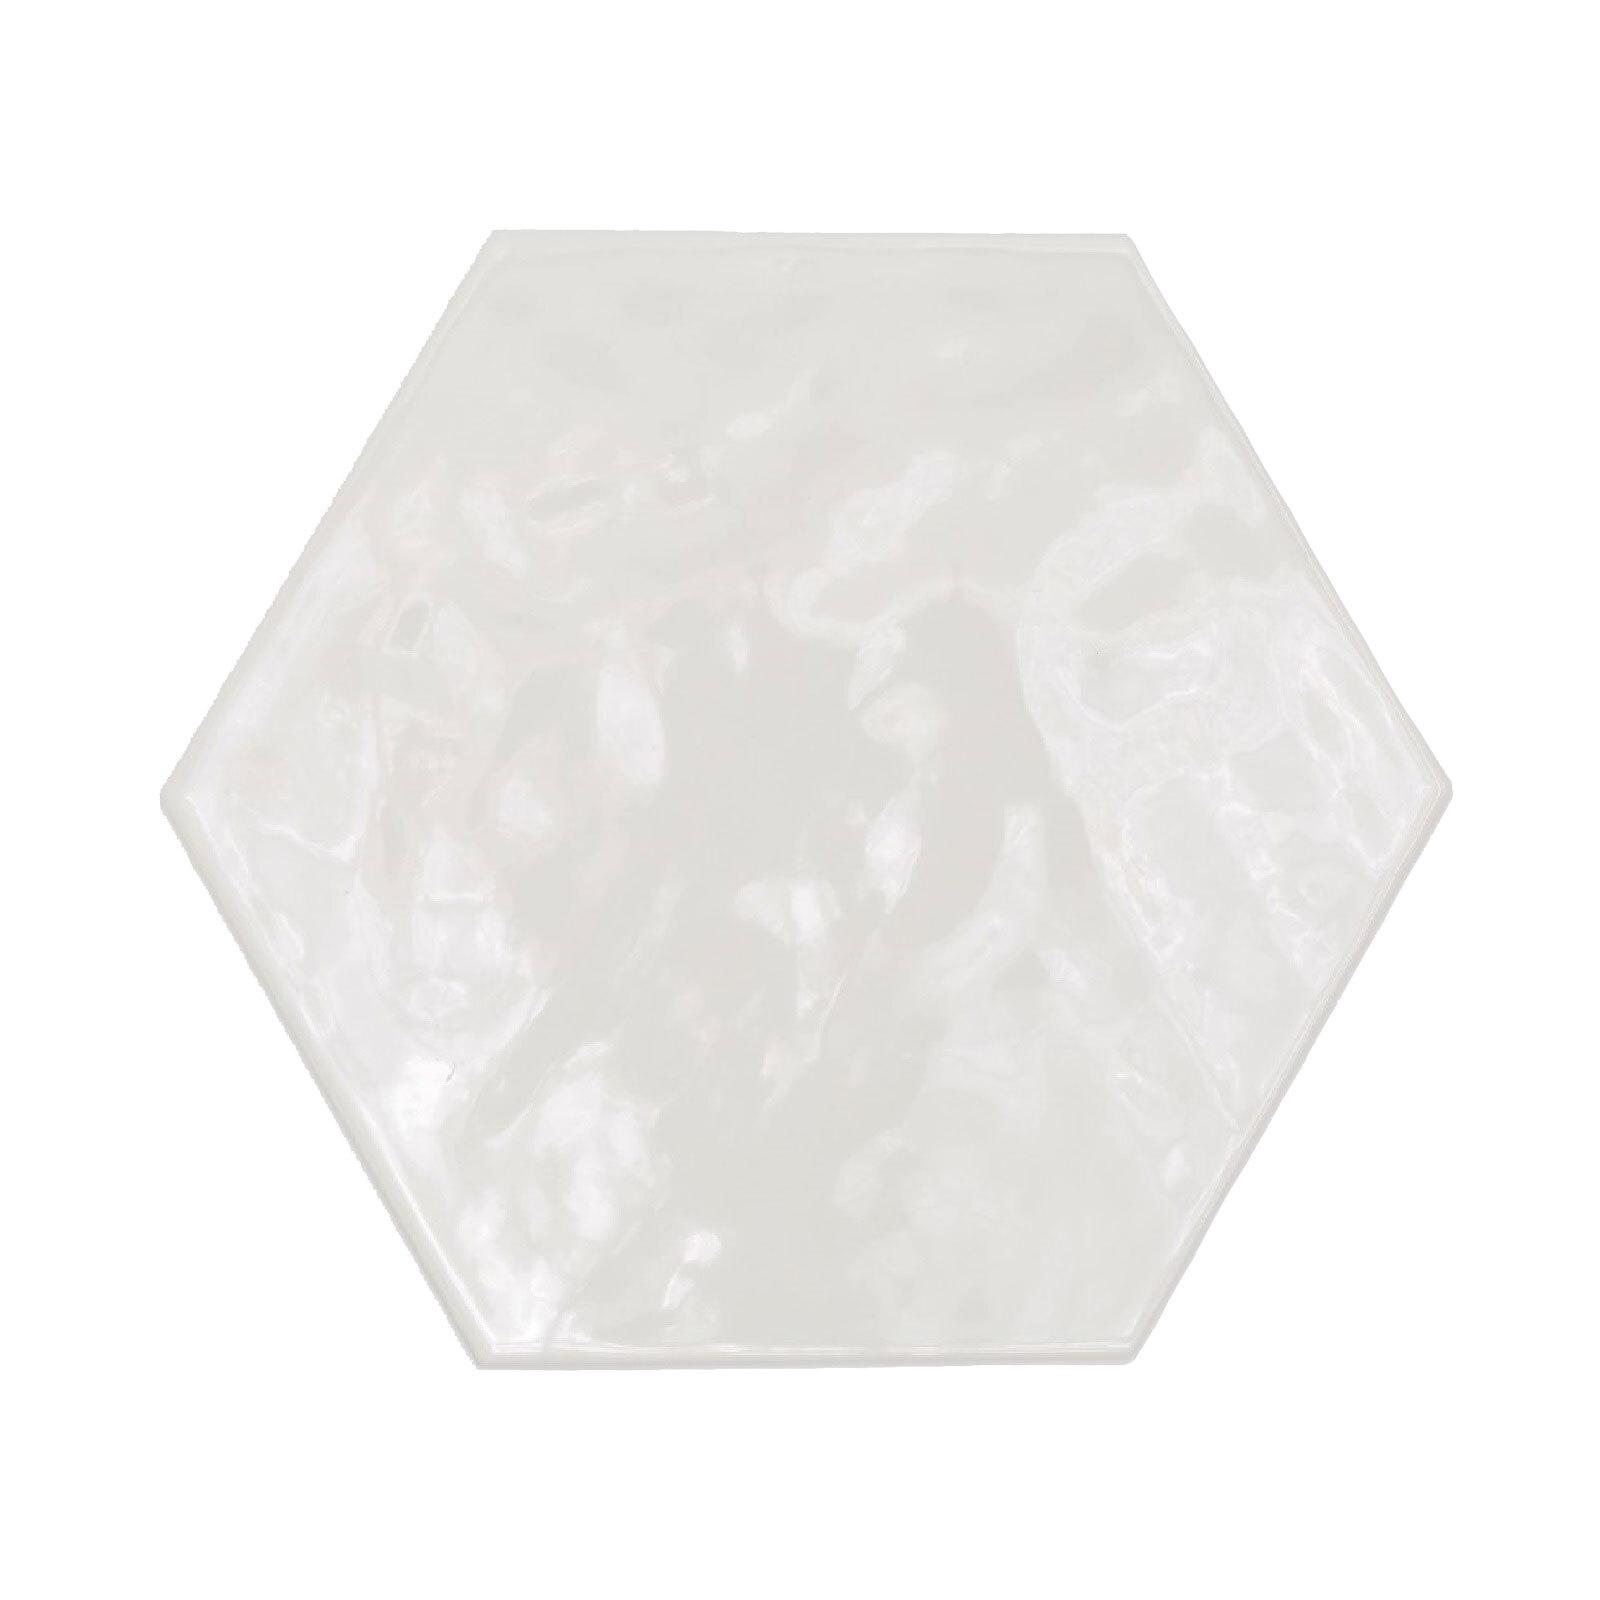 Decor8 200 x 175mm Super White Hexagon Devonshire Ceramic Wall Tiles - 37 Pack